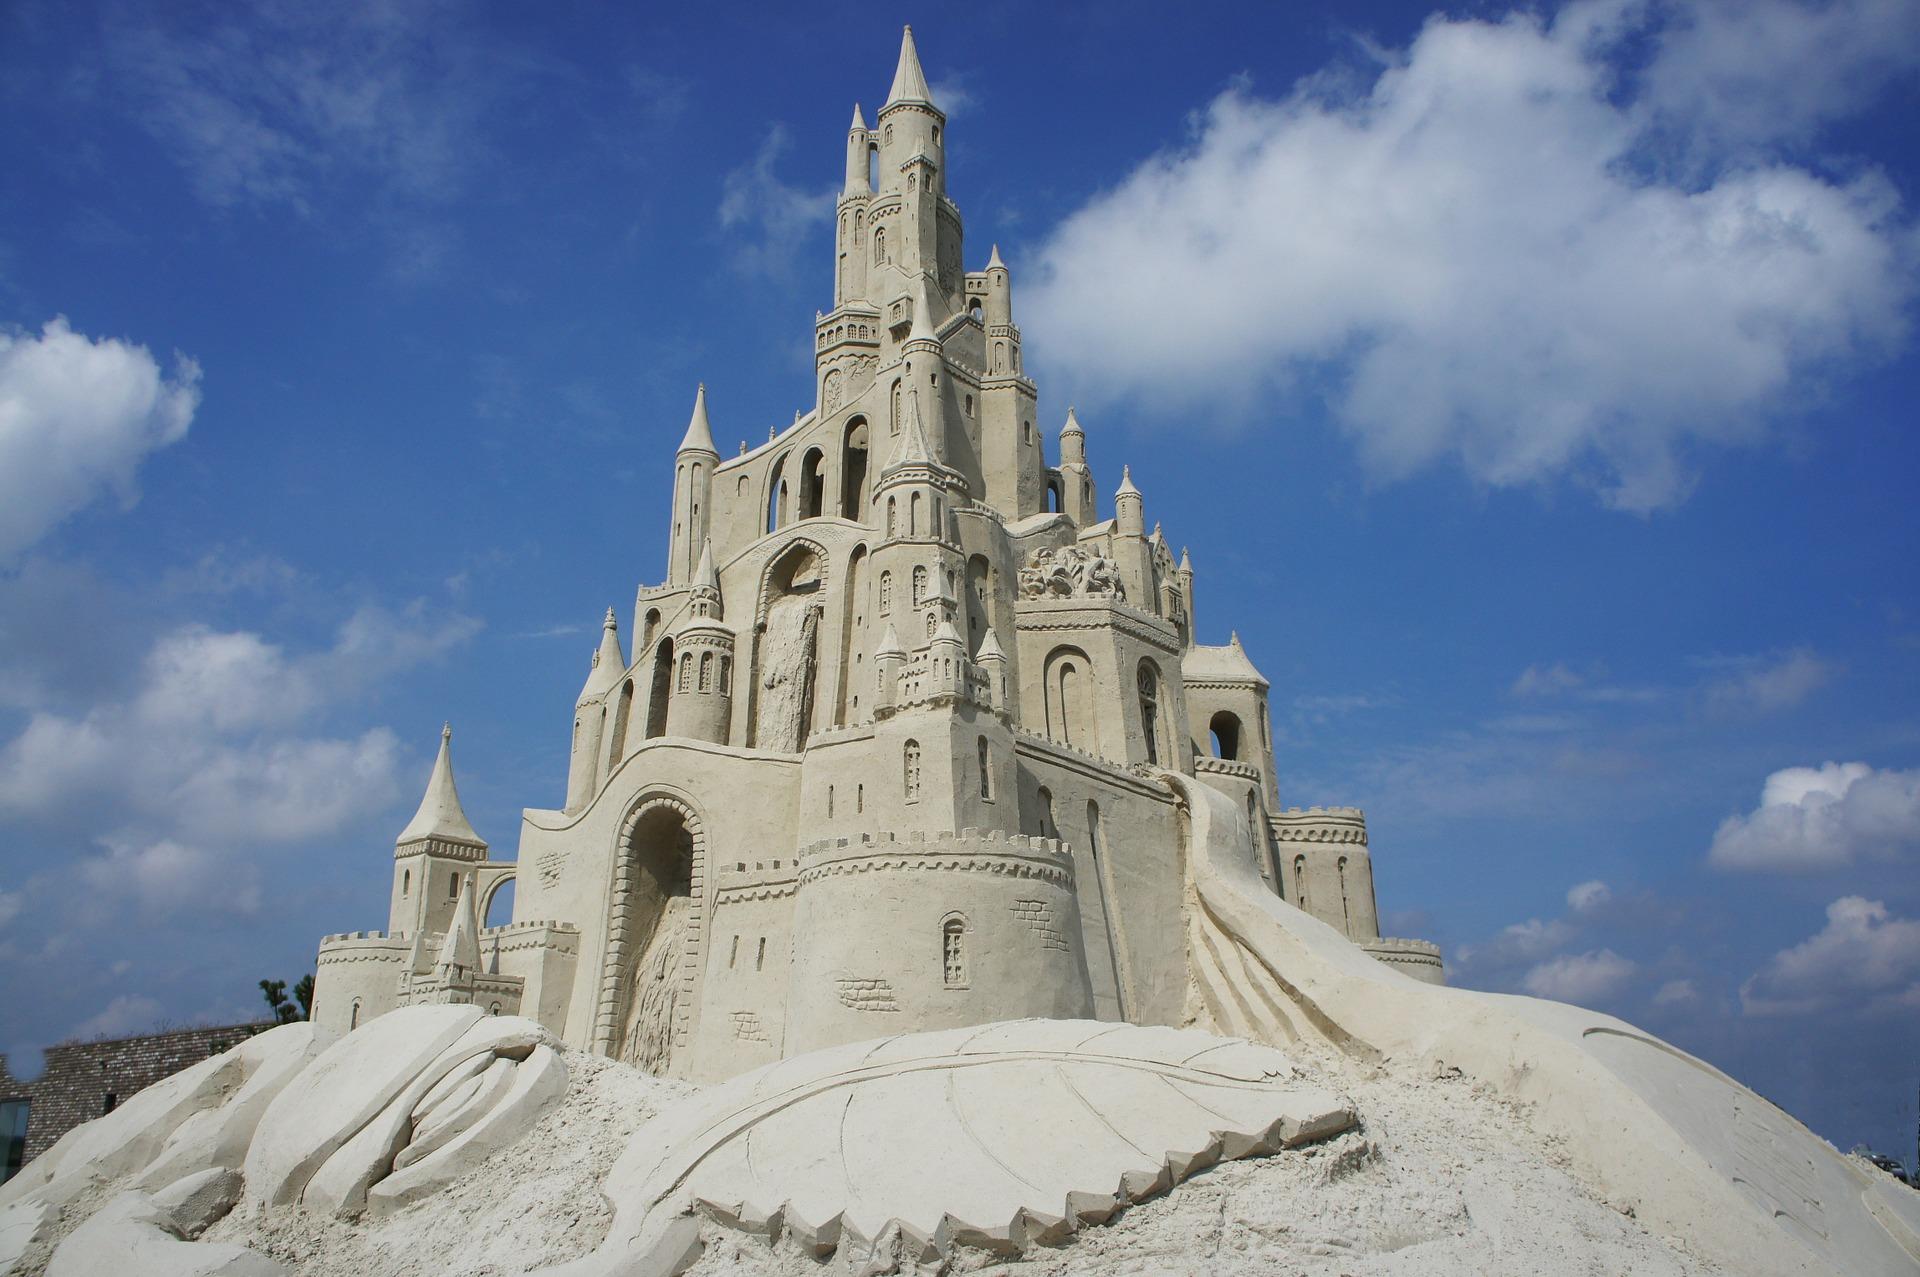 A massive multiple story sand castle